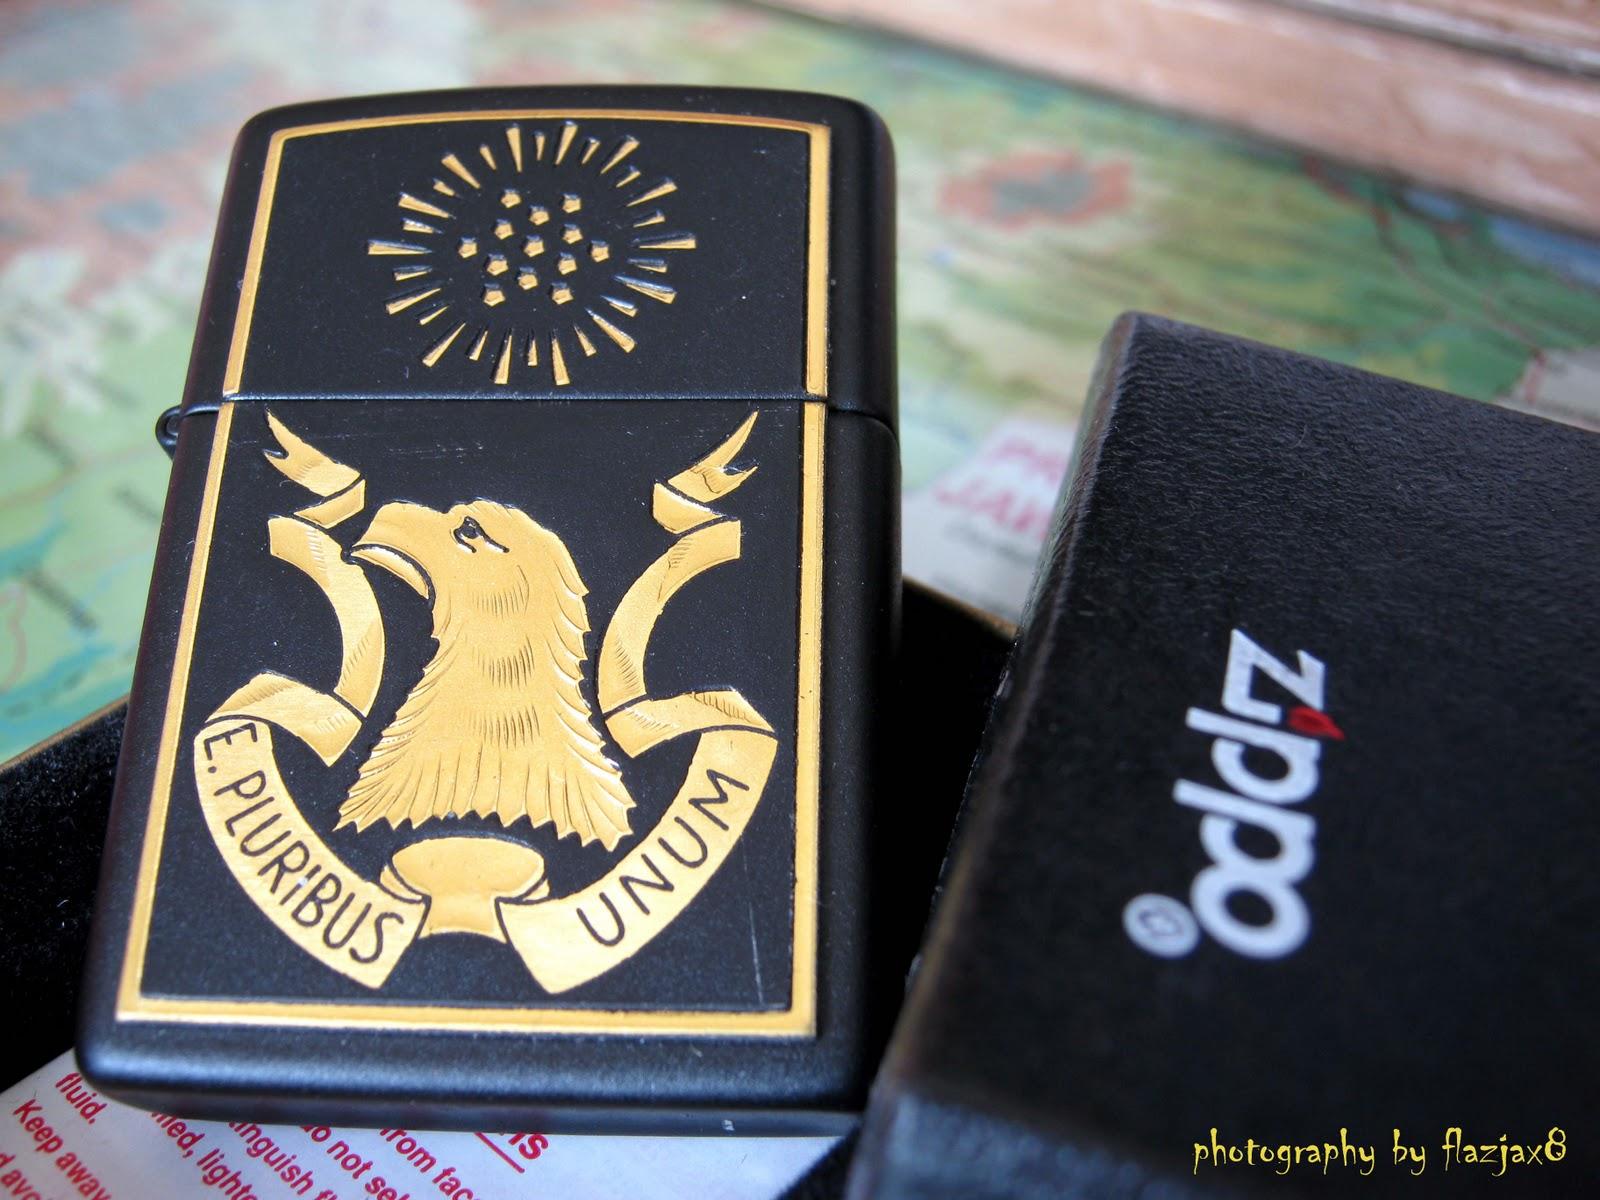 Toko Zippo - flazjax8: PO - Eagle of Justice - E. Pluribus